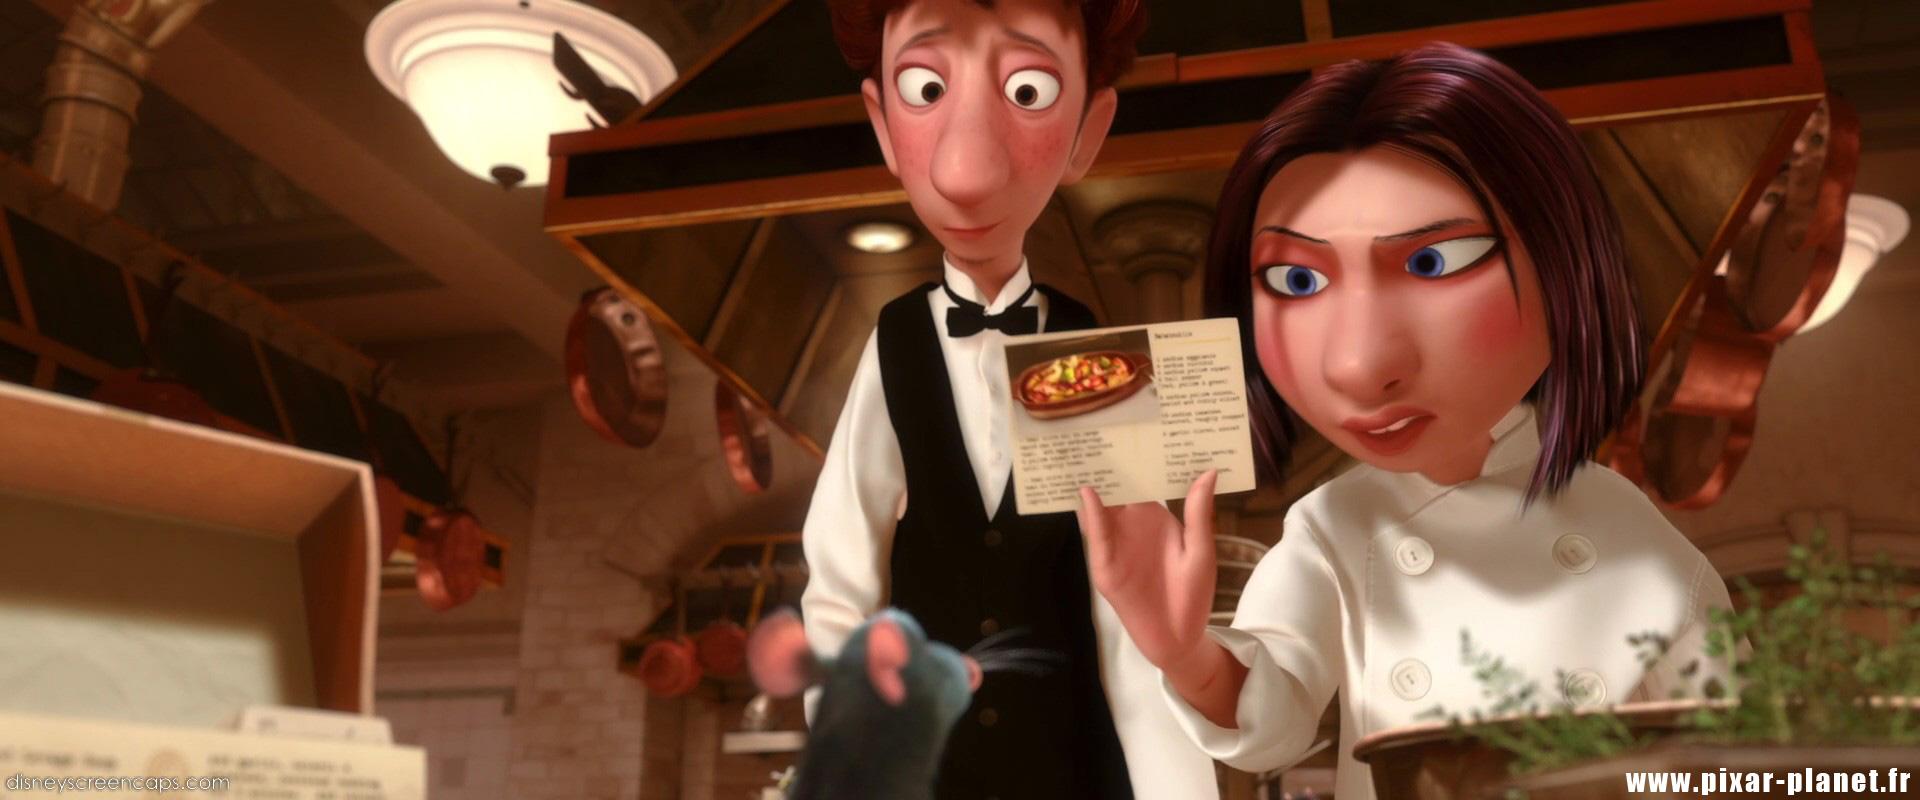 Pixar Planet Disney ratatouille